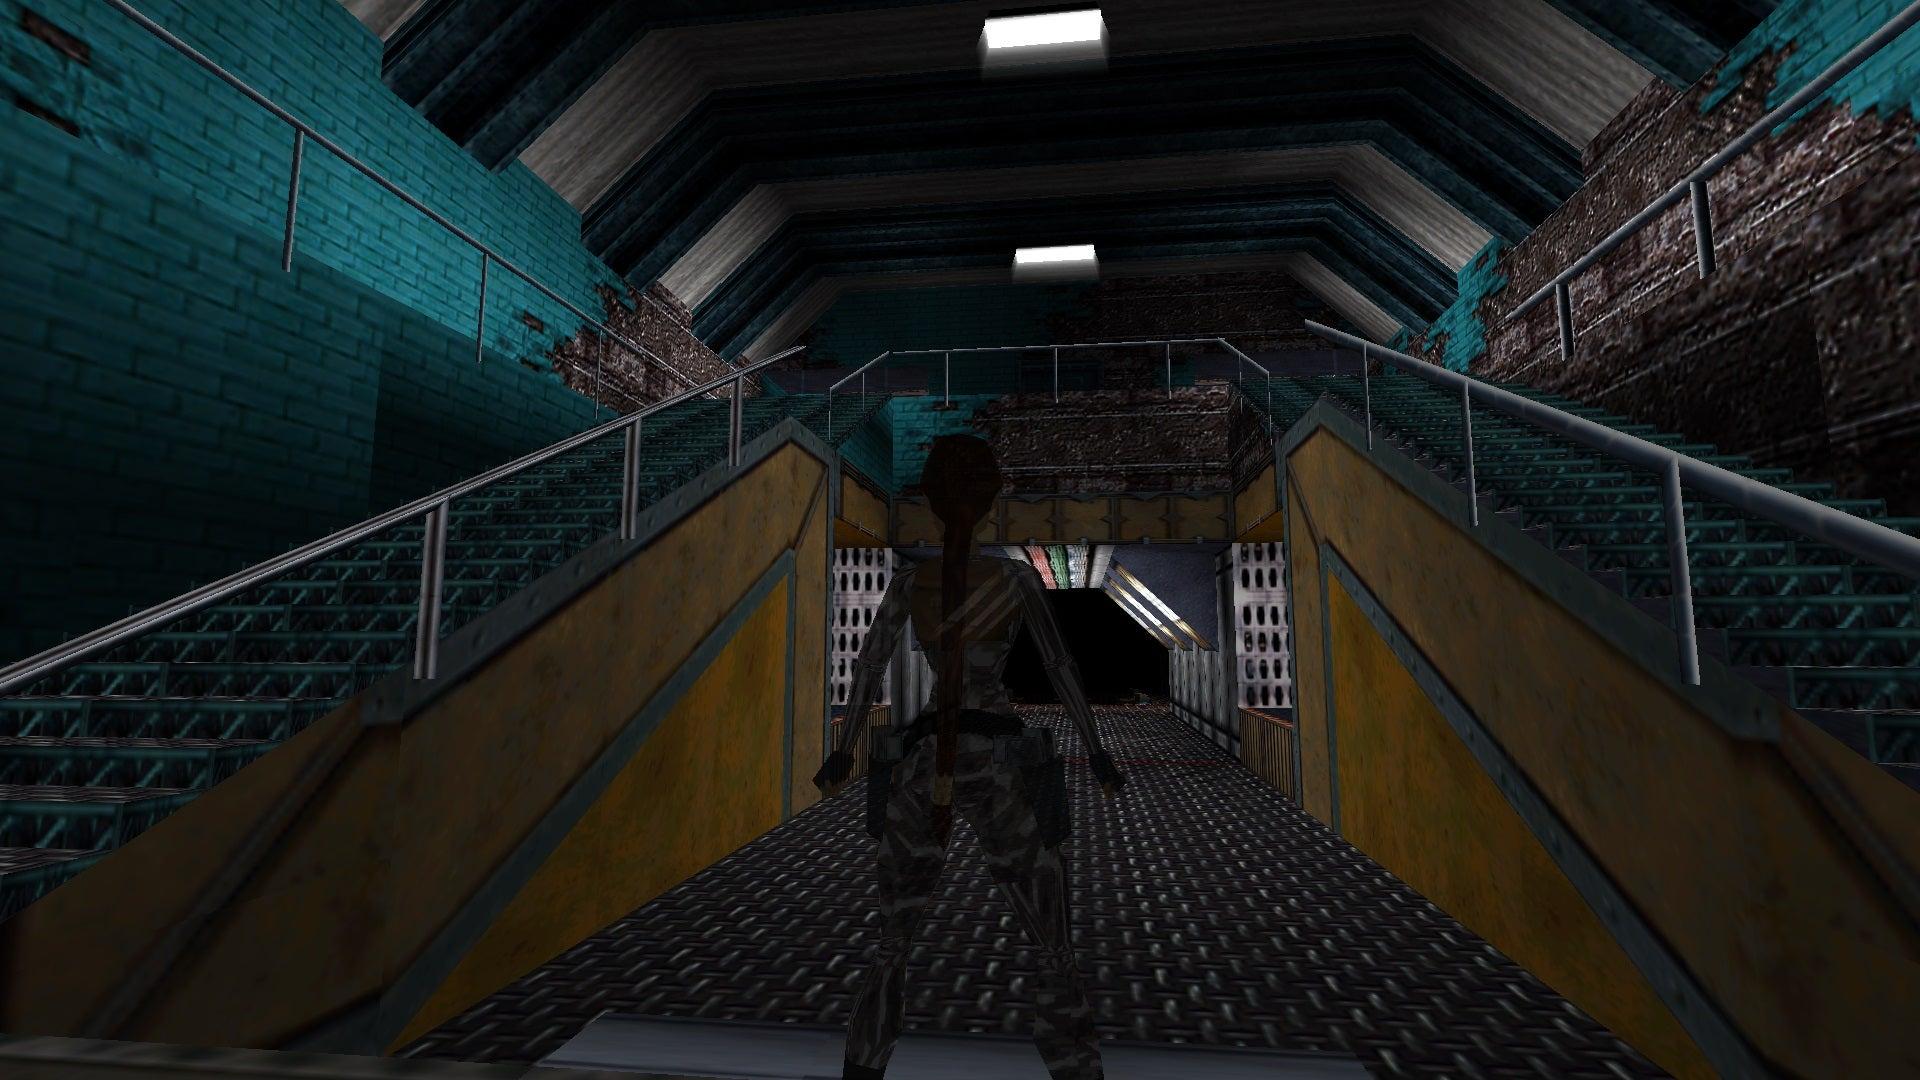 A screenshot from the Tomb Raider custom level called Big Trouble in Siberia